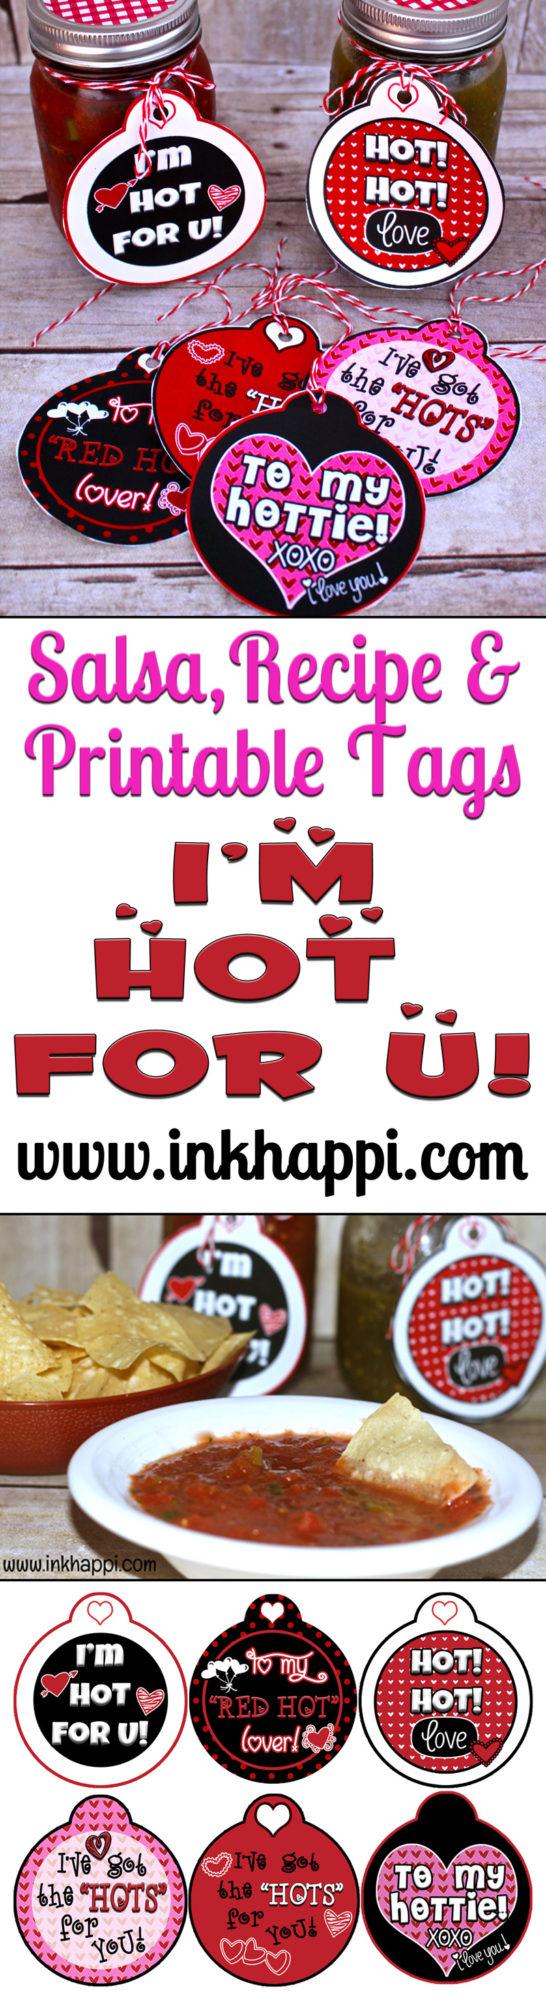 HOT for U! Cute printable tags and a salsa recipe. Fun Valentine gift idea. :)